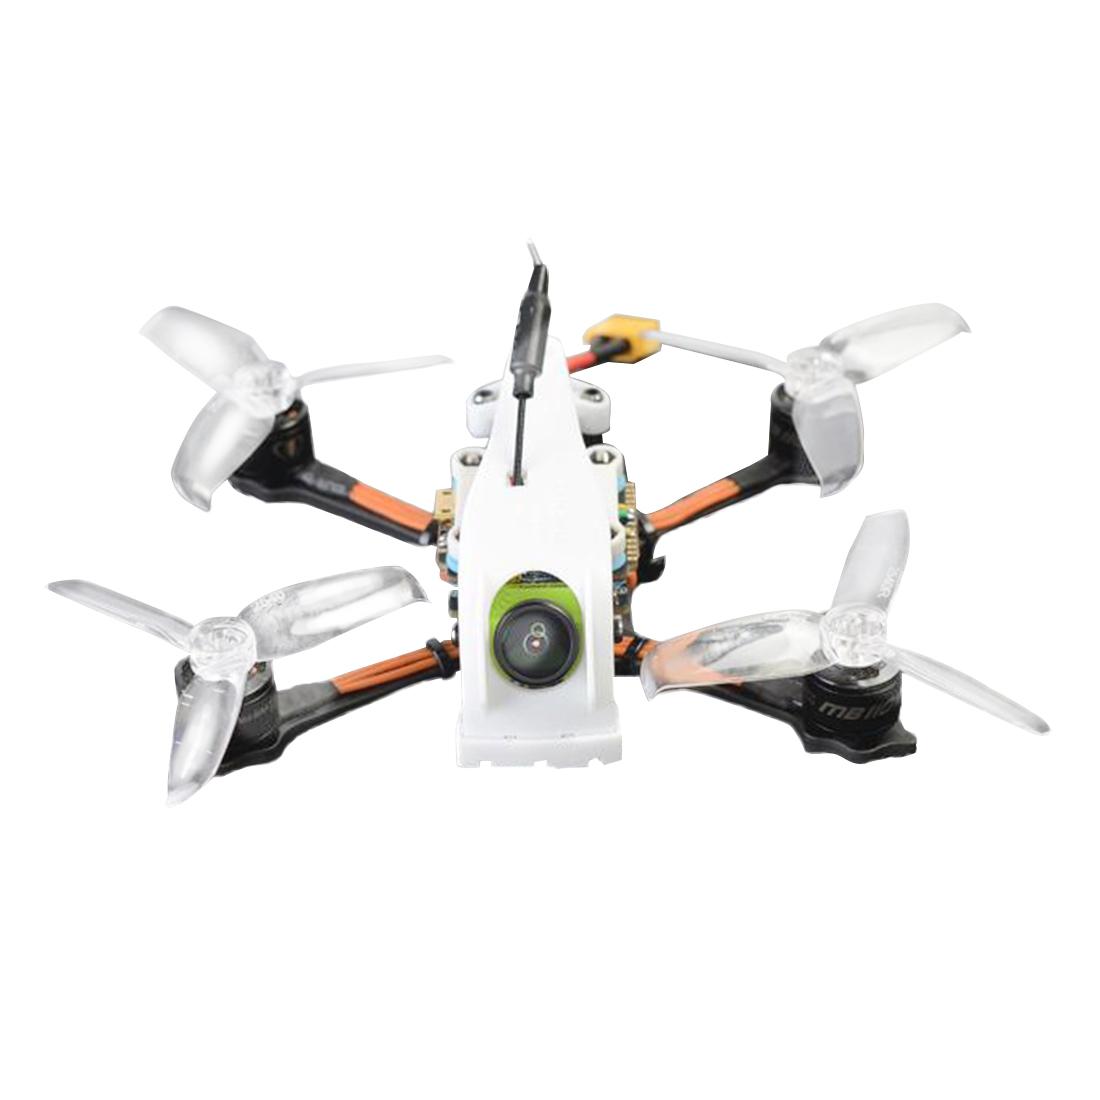 DIATONE GTR249+ 115mm PNP 2 5 Inch Indoor FPV Racing Drone Quadcopter with  Mamba F405 Mini FC F25 4in1 ESC RunCam Micro Swift Camera TX200 VTX